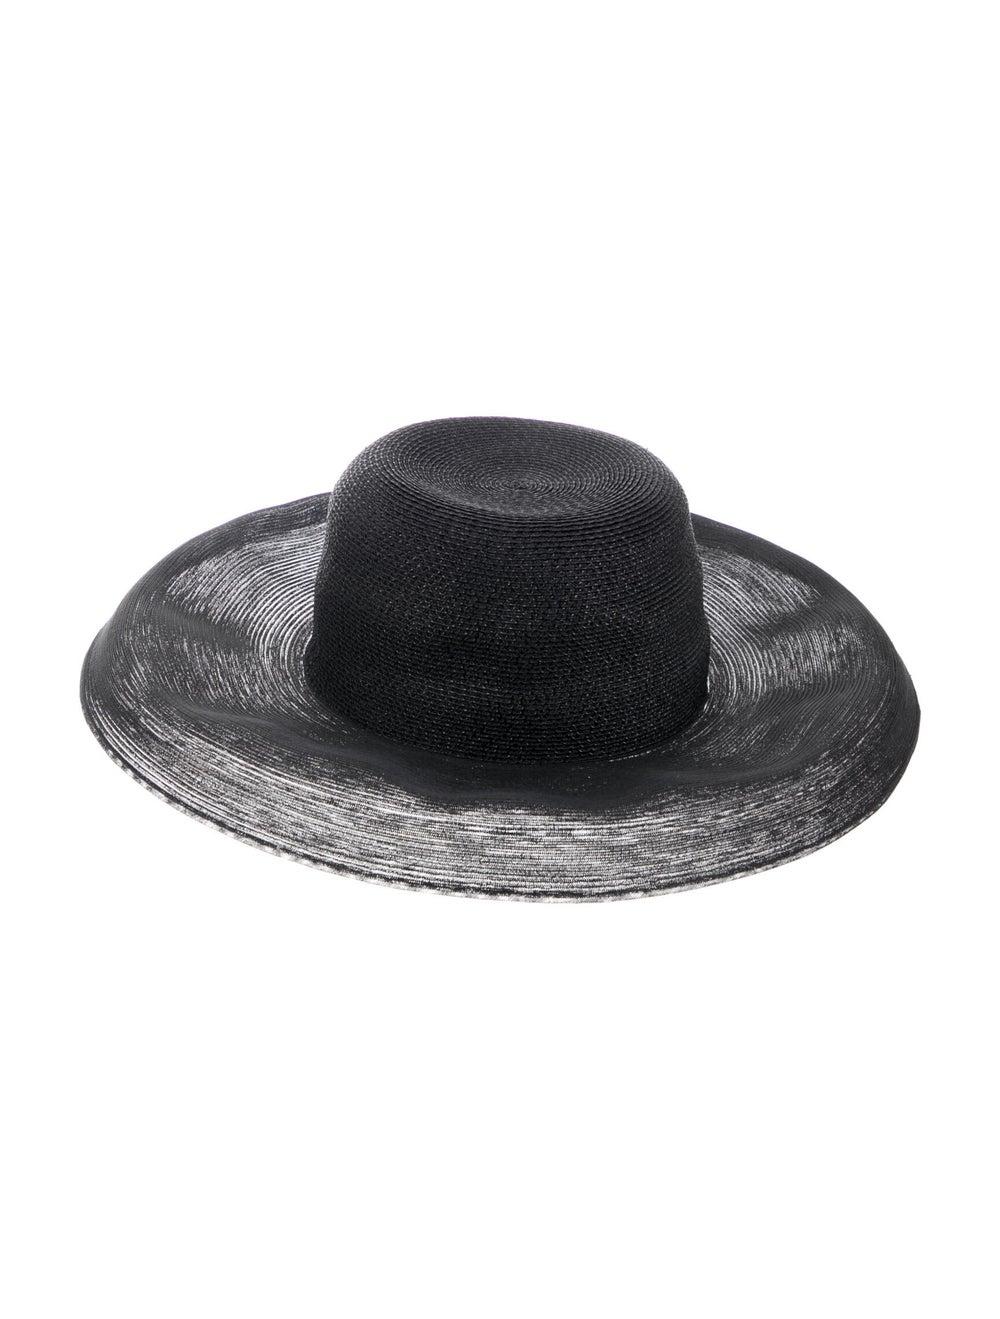 Patricia Underwood Wide Brim Hat Black - image 1